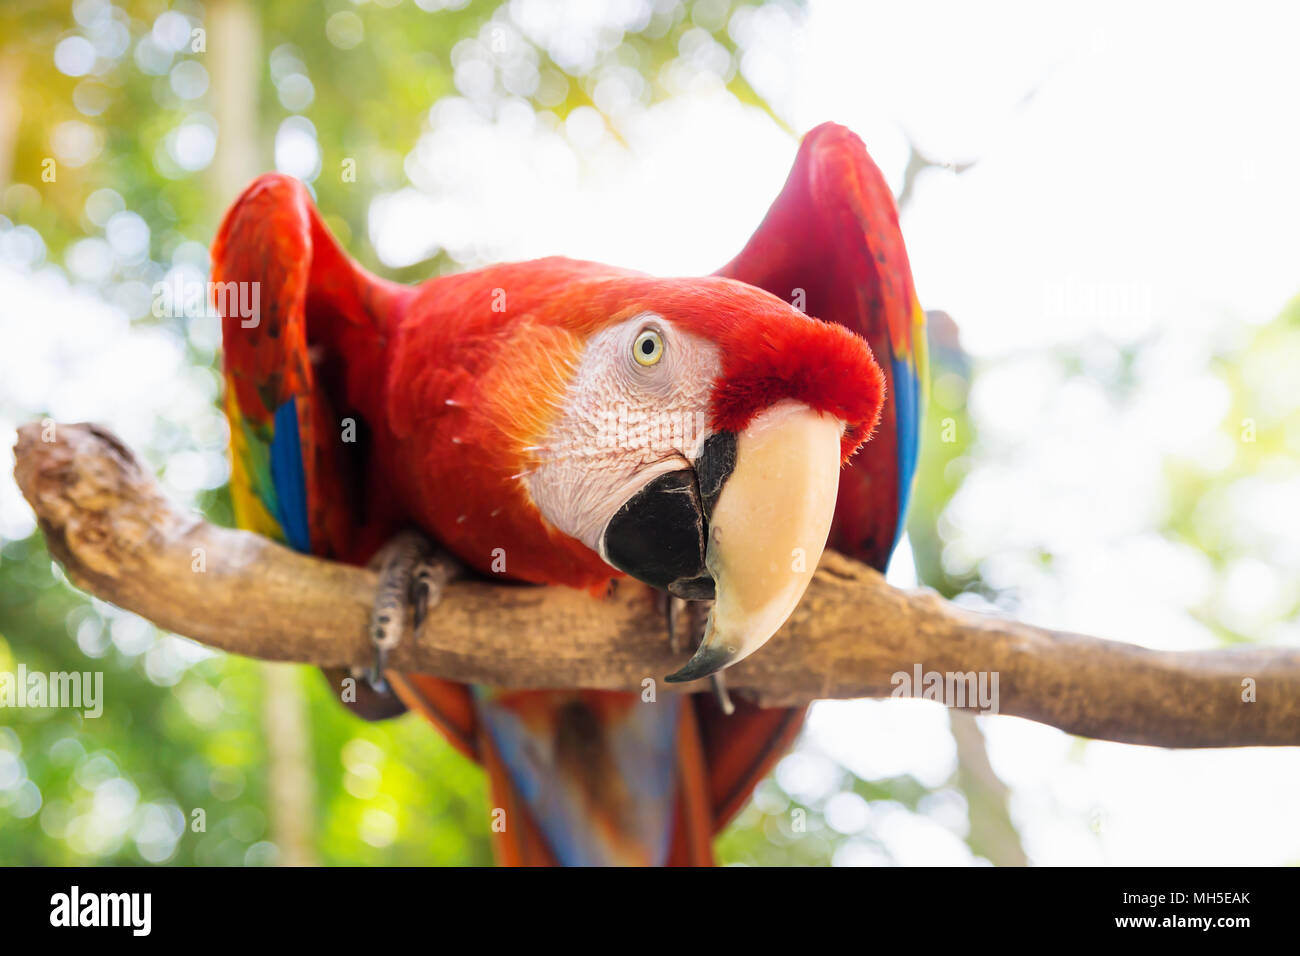 Scarlett Macaw bird parrot looking curious in Macaw Mountain, Copan Ruinas, Honduras, Central America Stock Photo